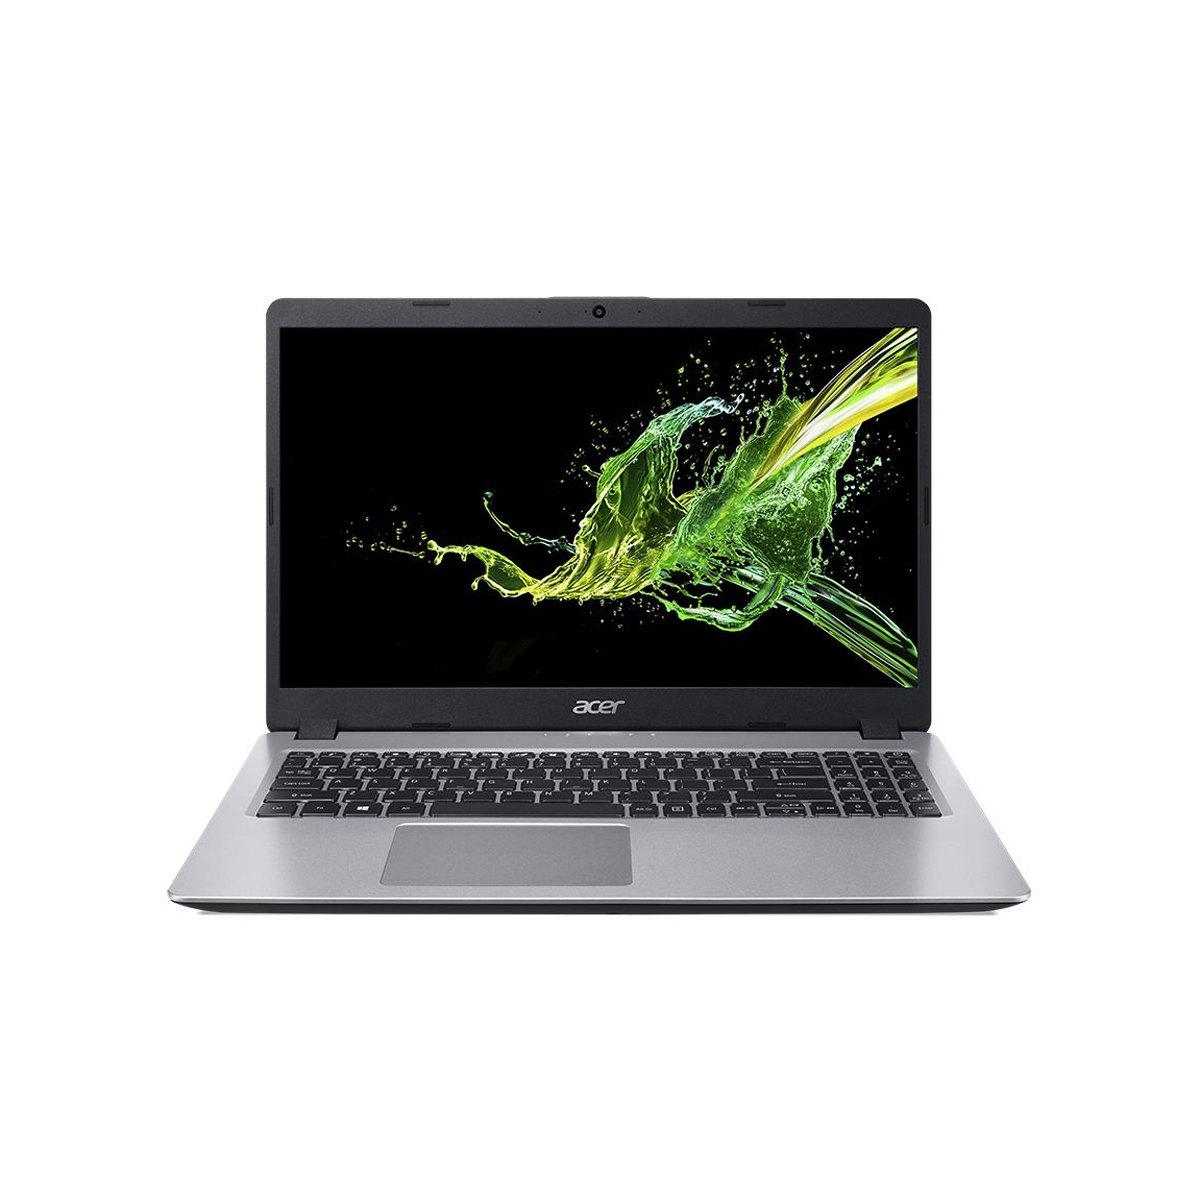 Notebook Acer A515 Core I5 8265u Memoria 8gb Ddr4 Ssd 480gb Tela 15.6' Led Hd Sistema Windows 10 Home